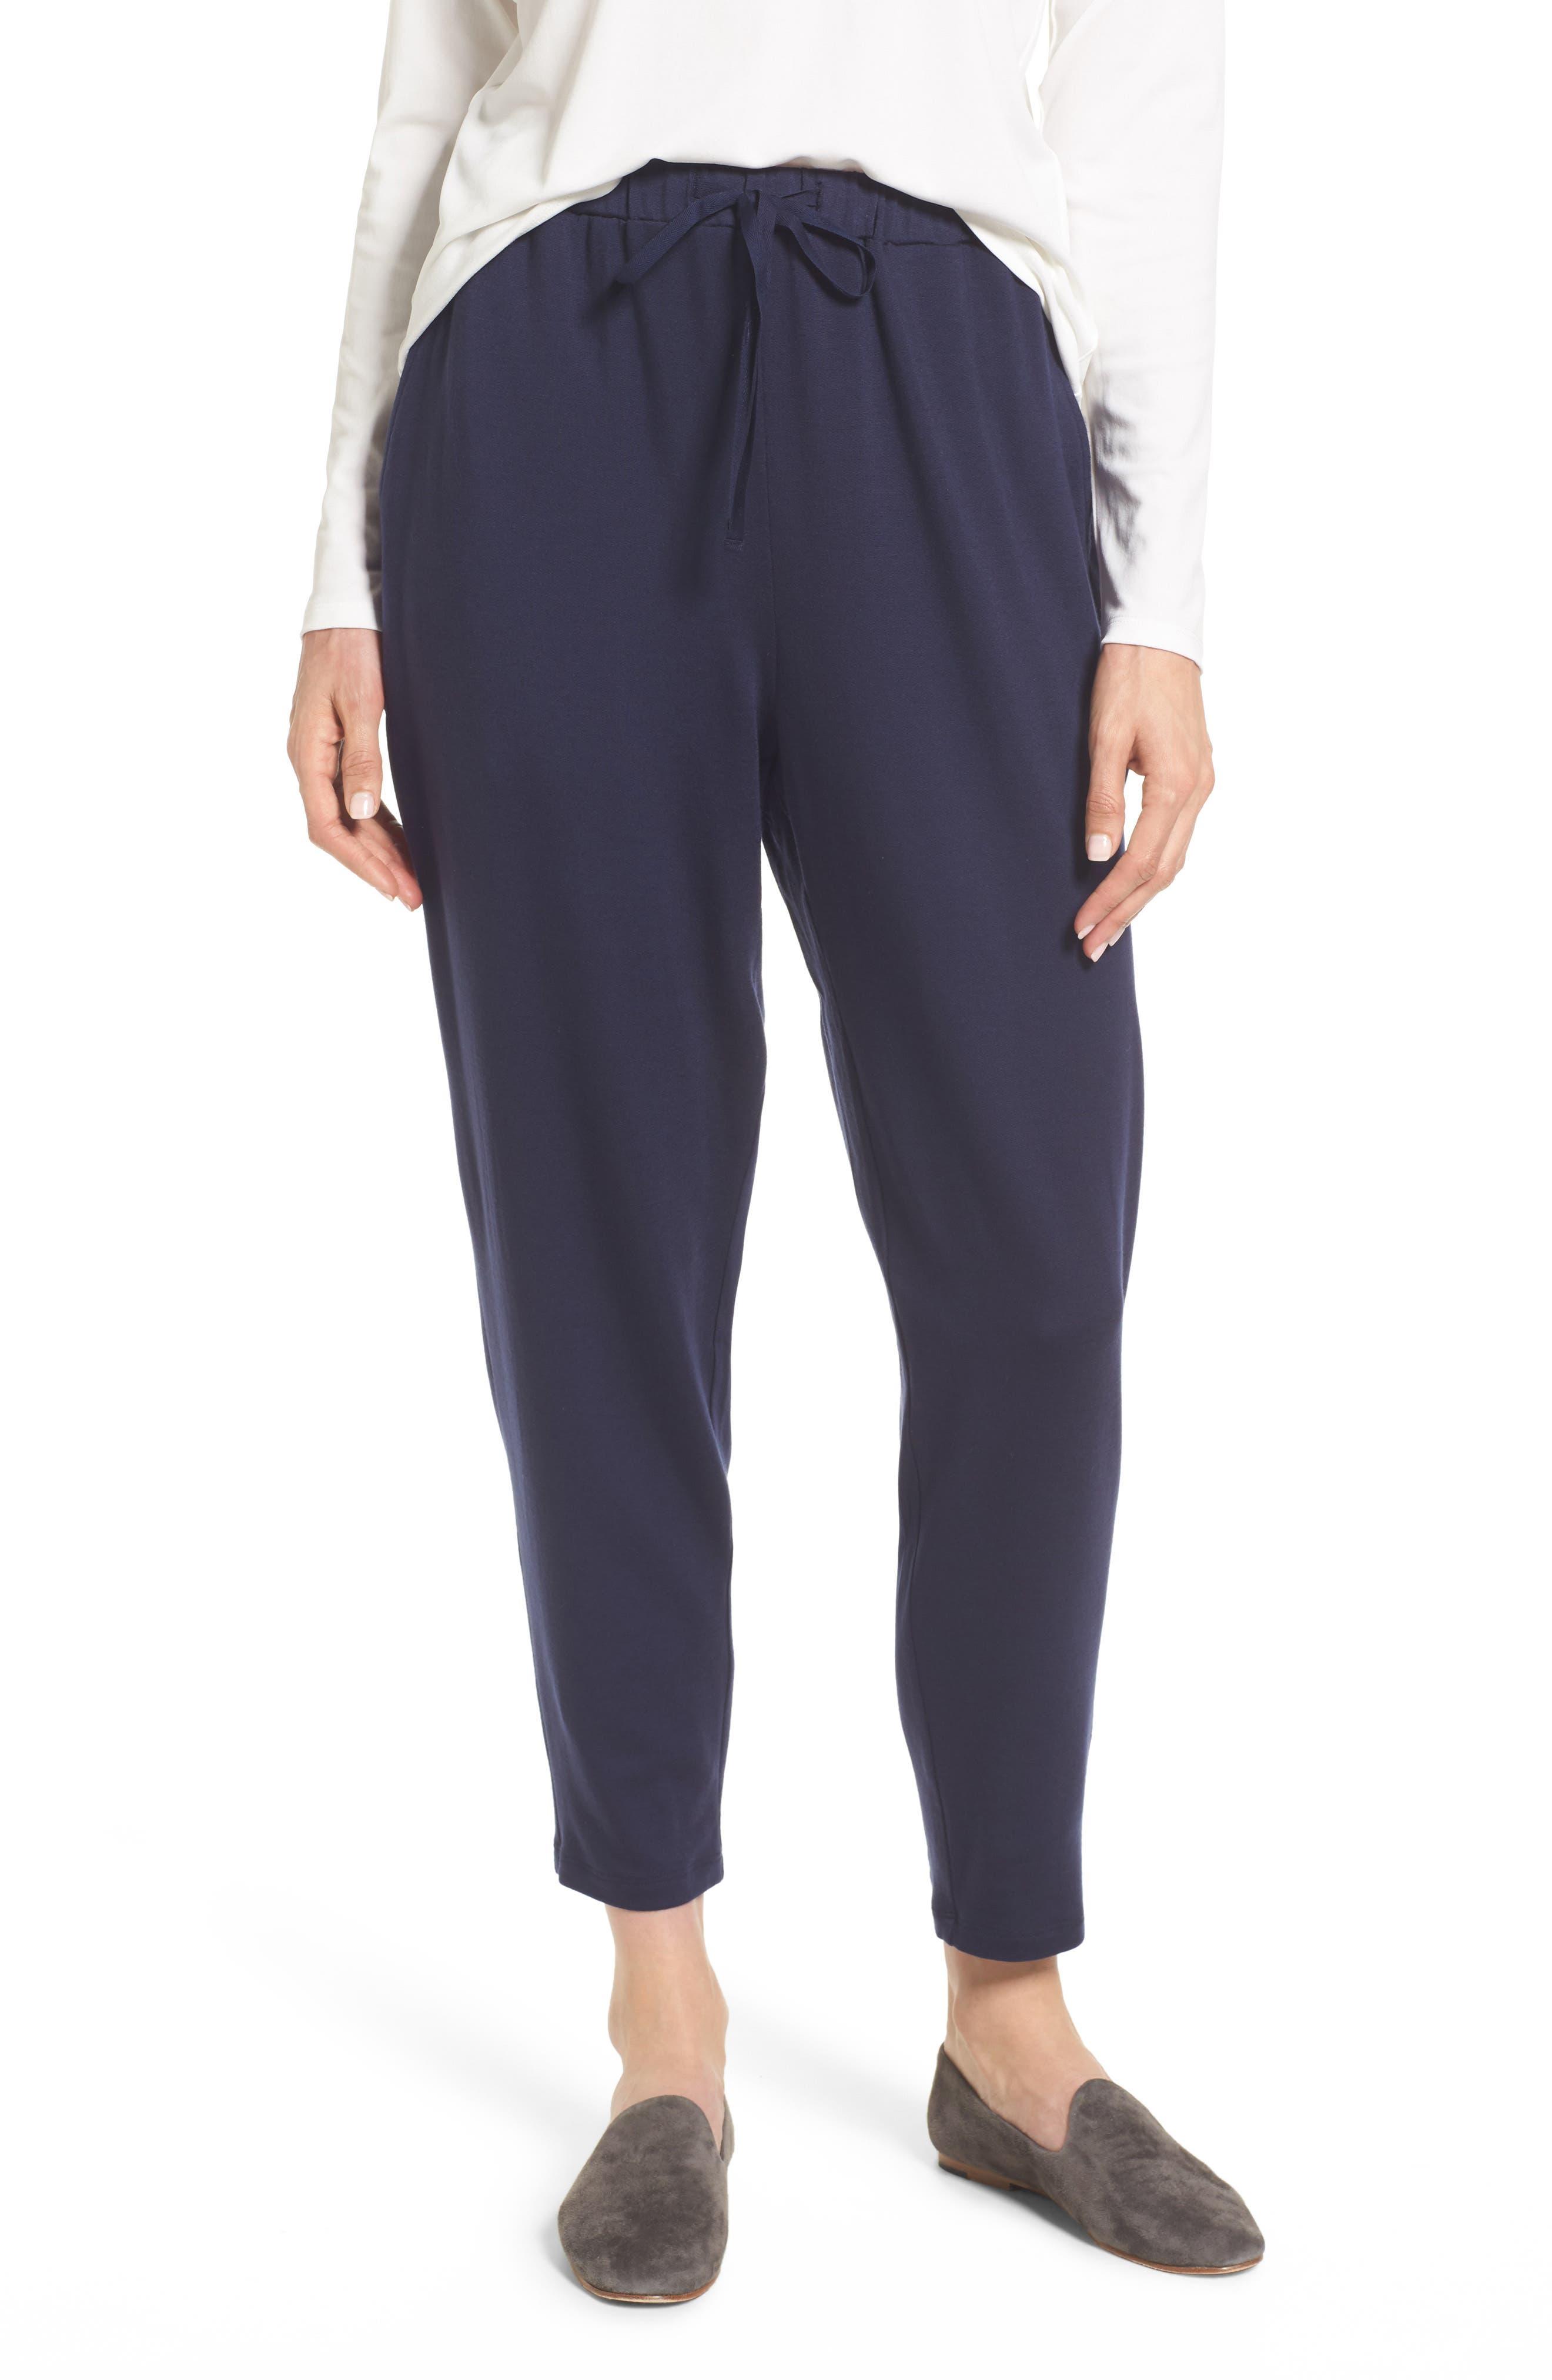 Alternate Image 1 Selected - Eileen Fisher Drawstring Waist Knit Pants (Regular & Petite)